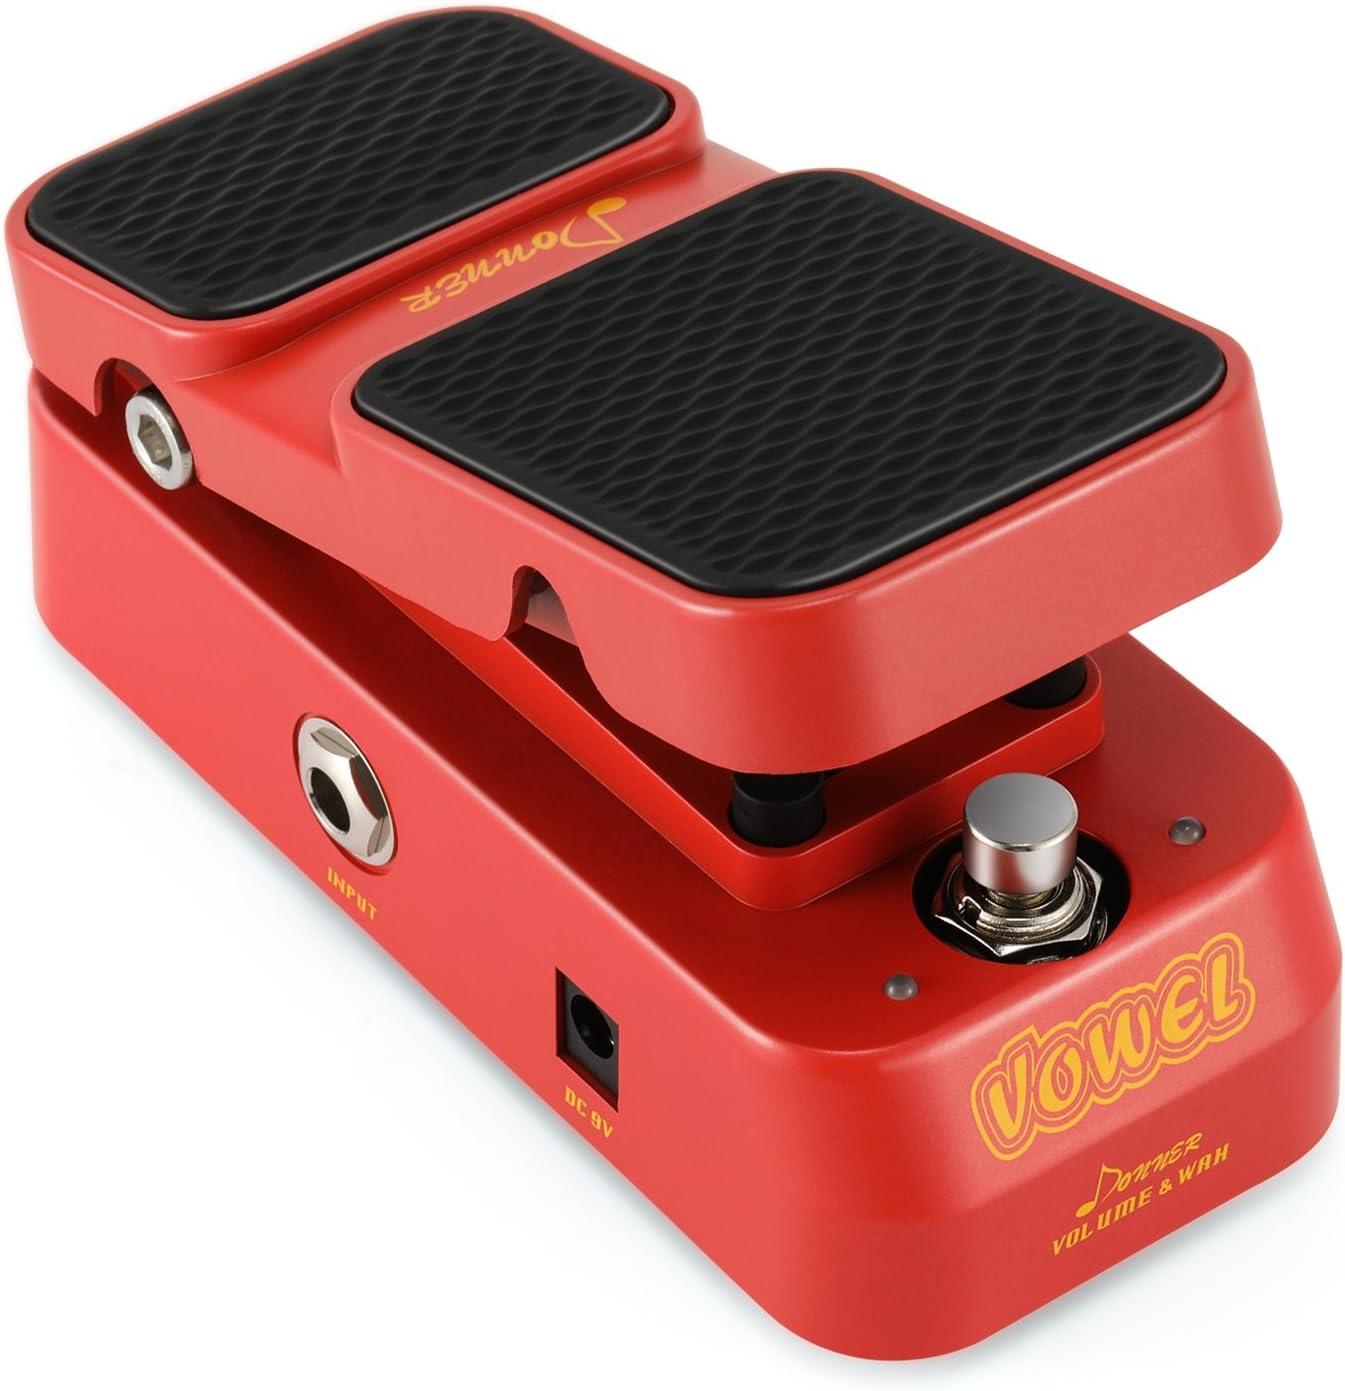 Donner Vowel Mini Wah / Pedal Volumen / Pedal de Efectos 2 en 1 para Guitarra